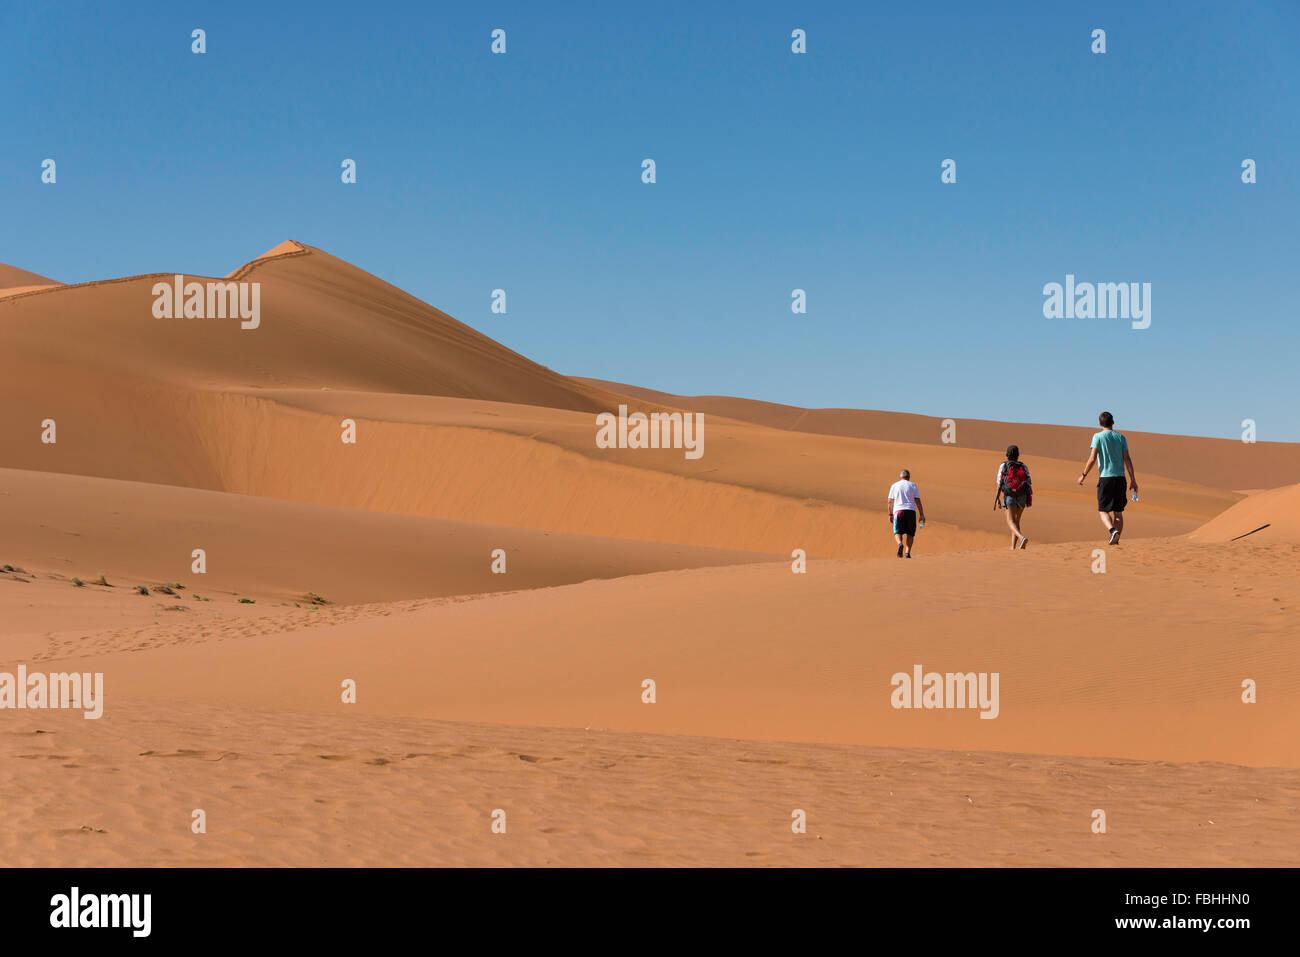 Group walking in desert, Sossusvlei, Namib Desert, Namib-Naukluft Park, Hardap Region, Republic of Namibia - Stock Image